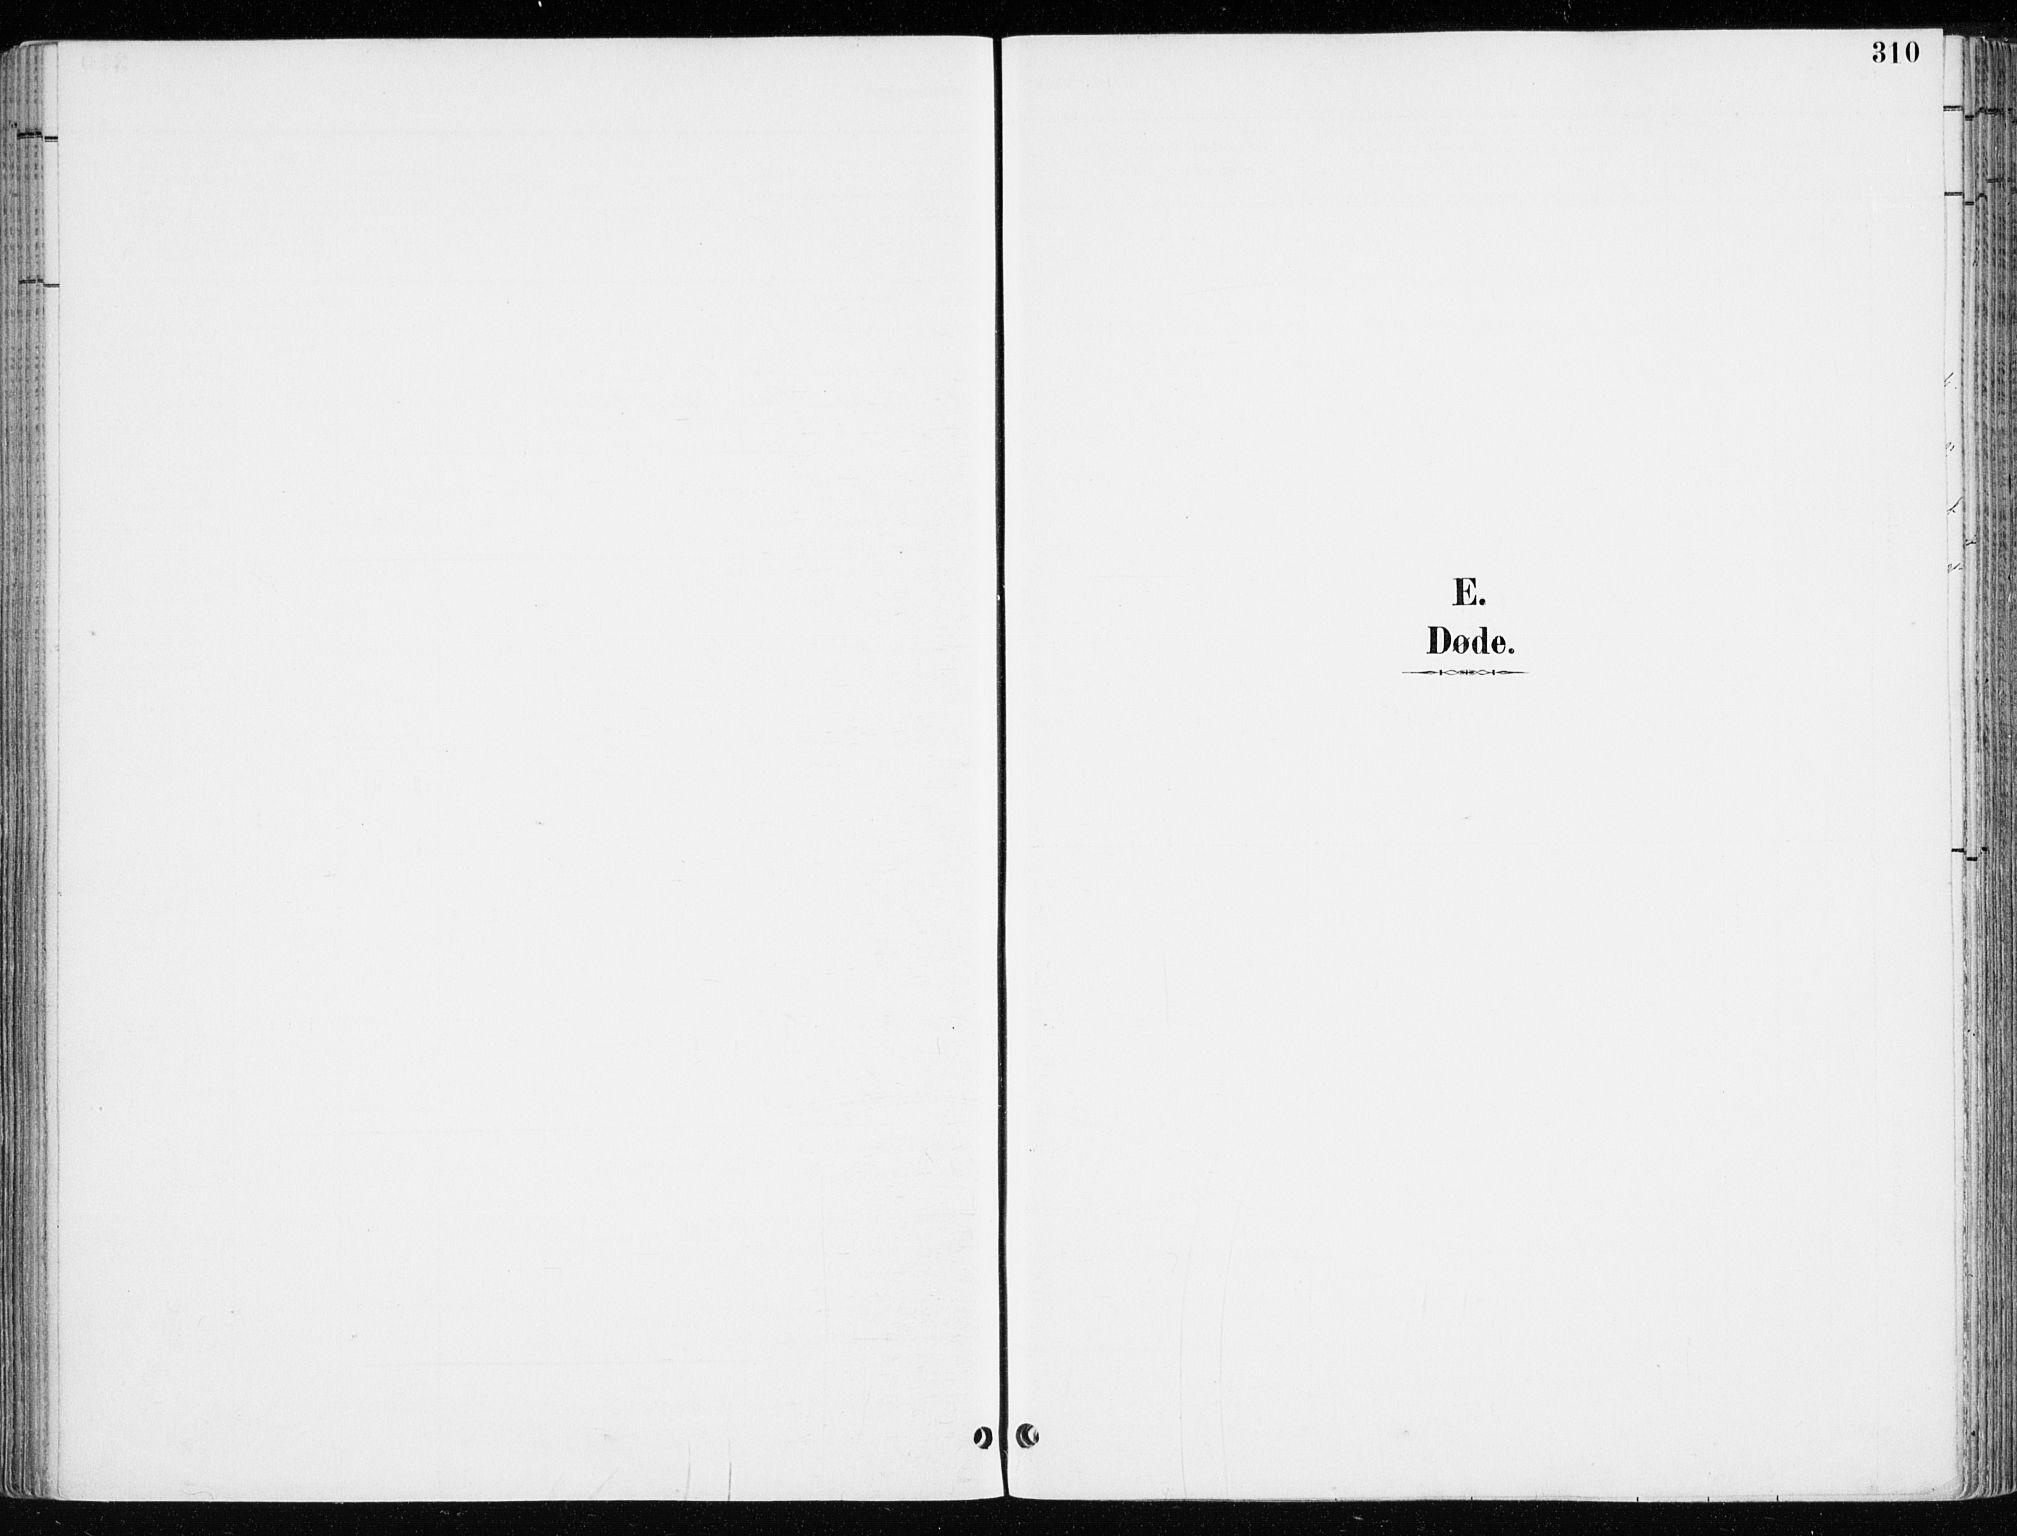 SAH, Løten prestekontor, K/Ka/L0010: Ministerialbok nr. 10, 1892-1907, s. 310